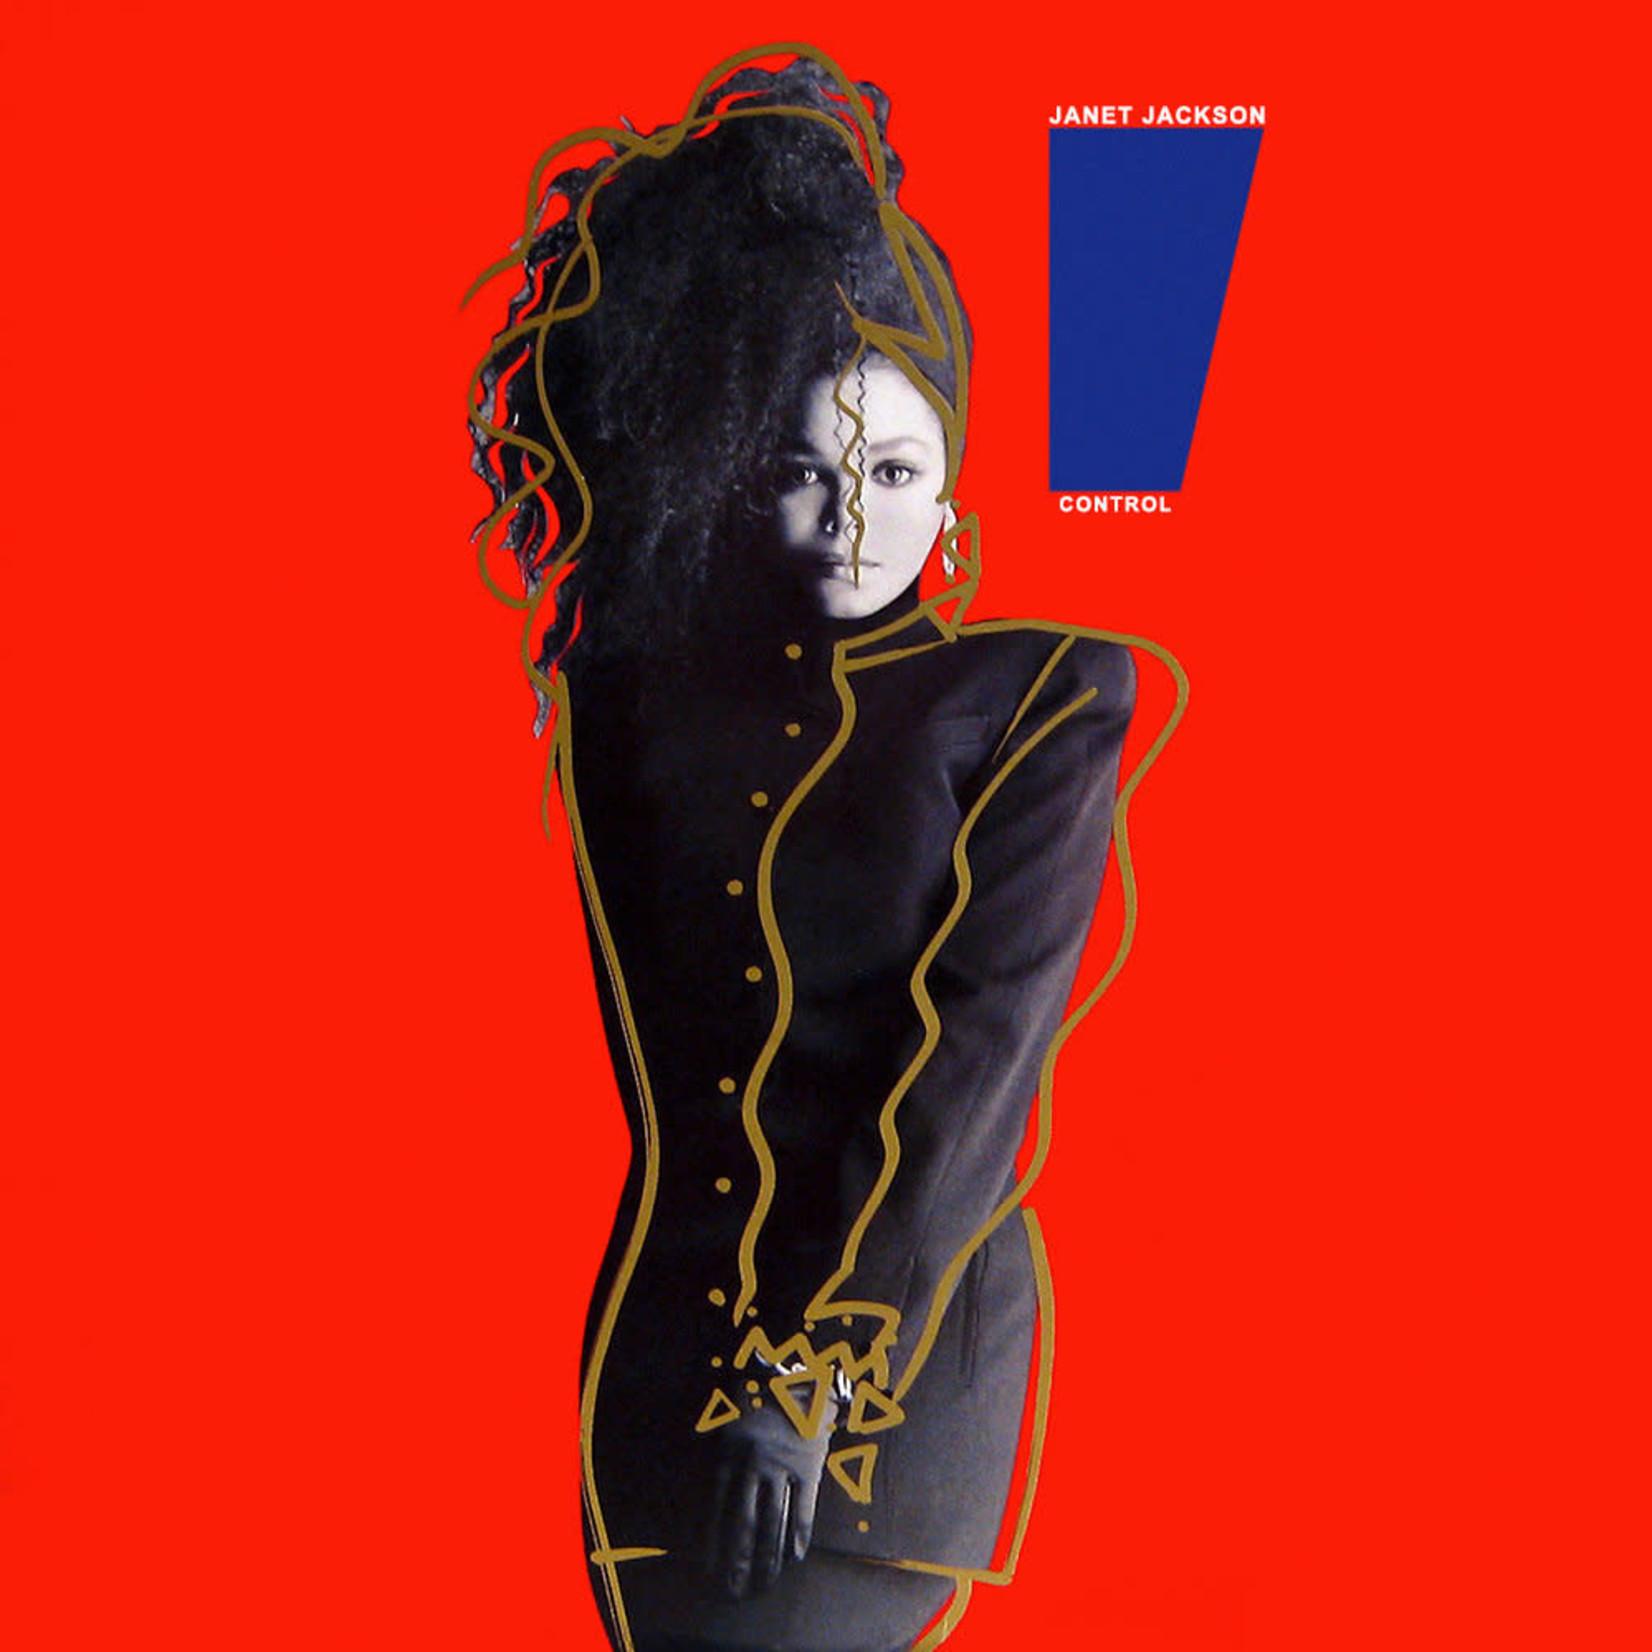 [Vintage] Jackson, Janet: Control